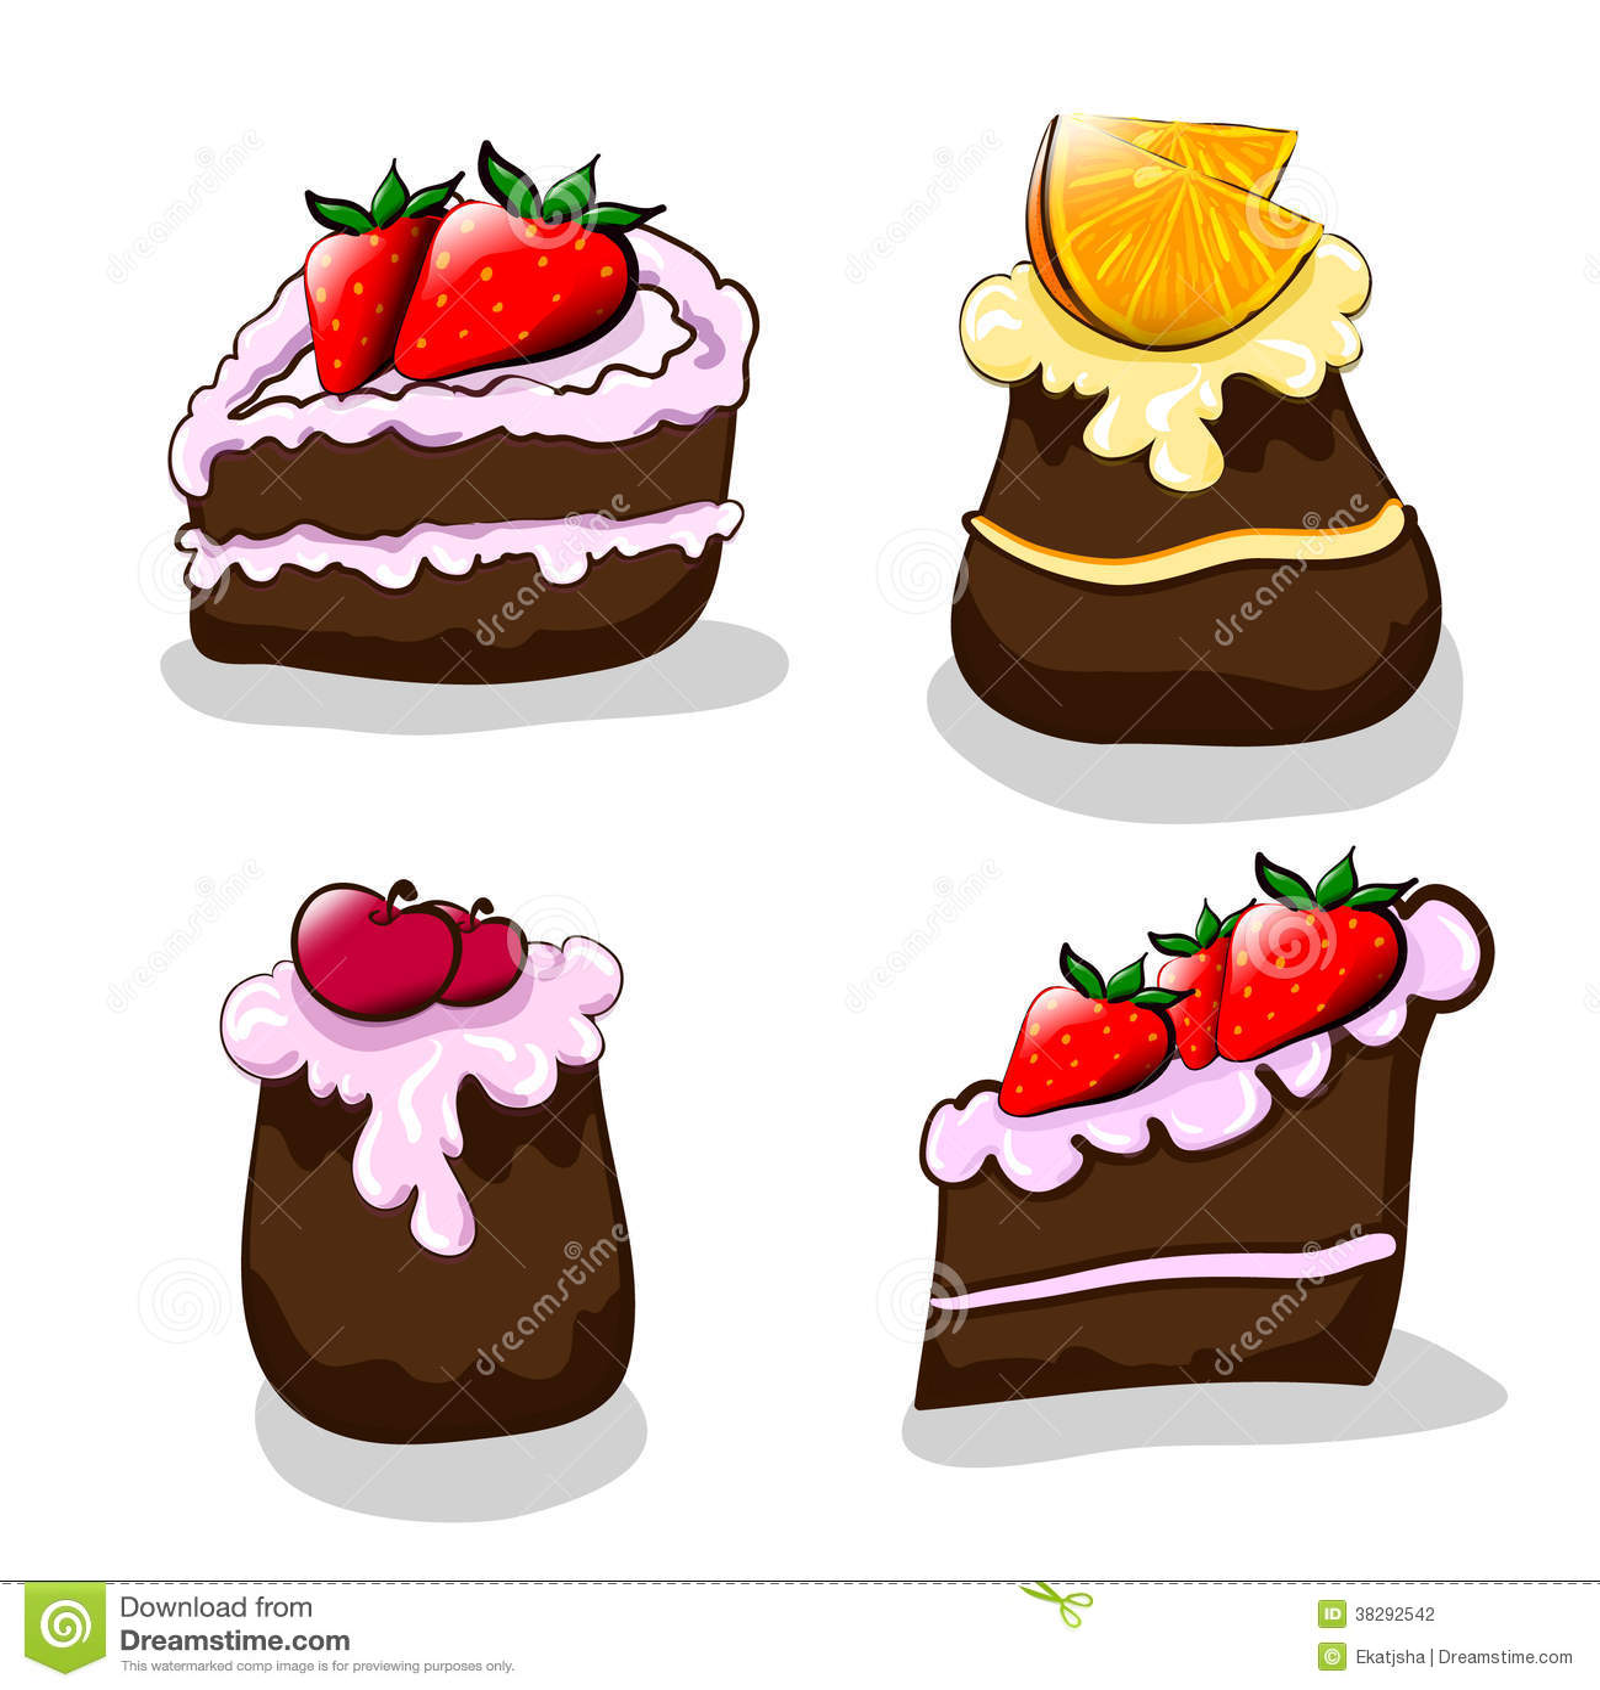 Cartoon Cakes Stock Photography - Image: 38292542